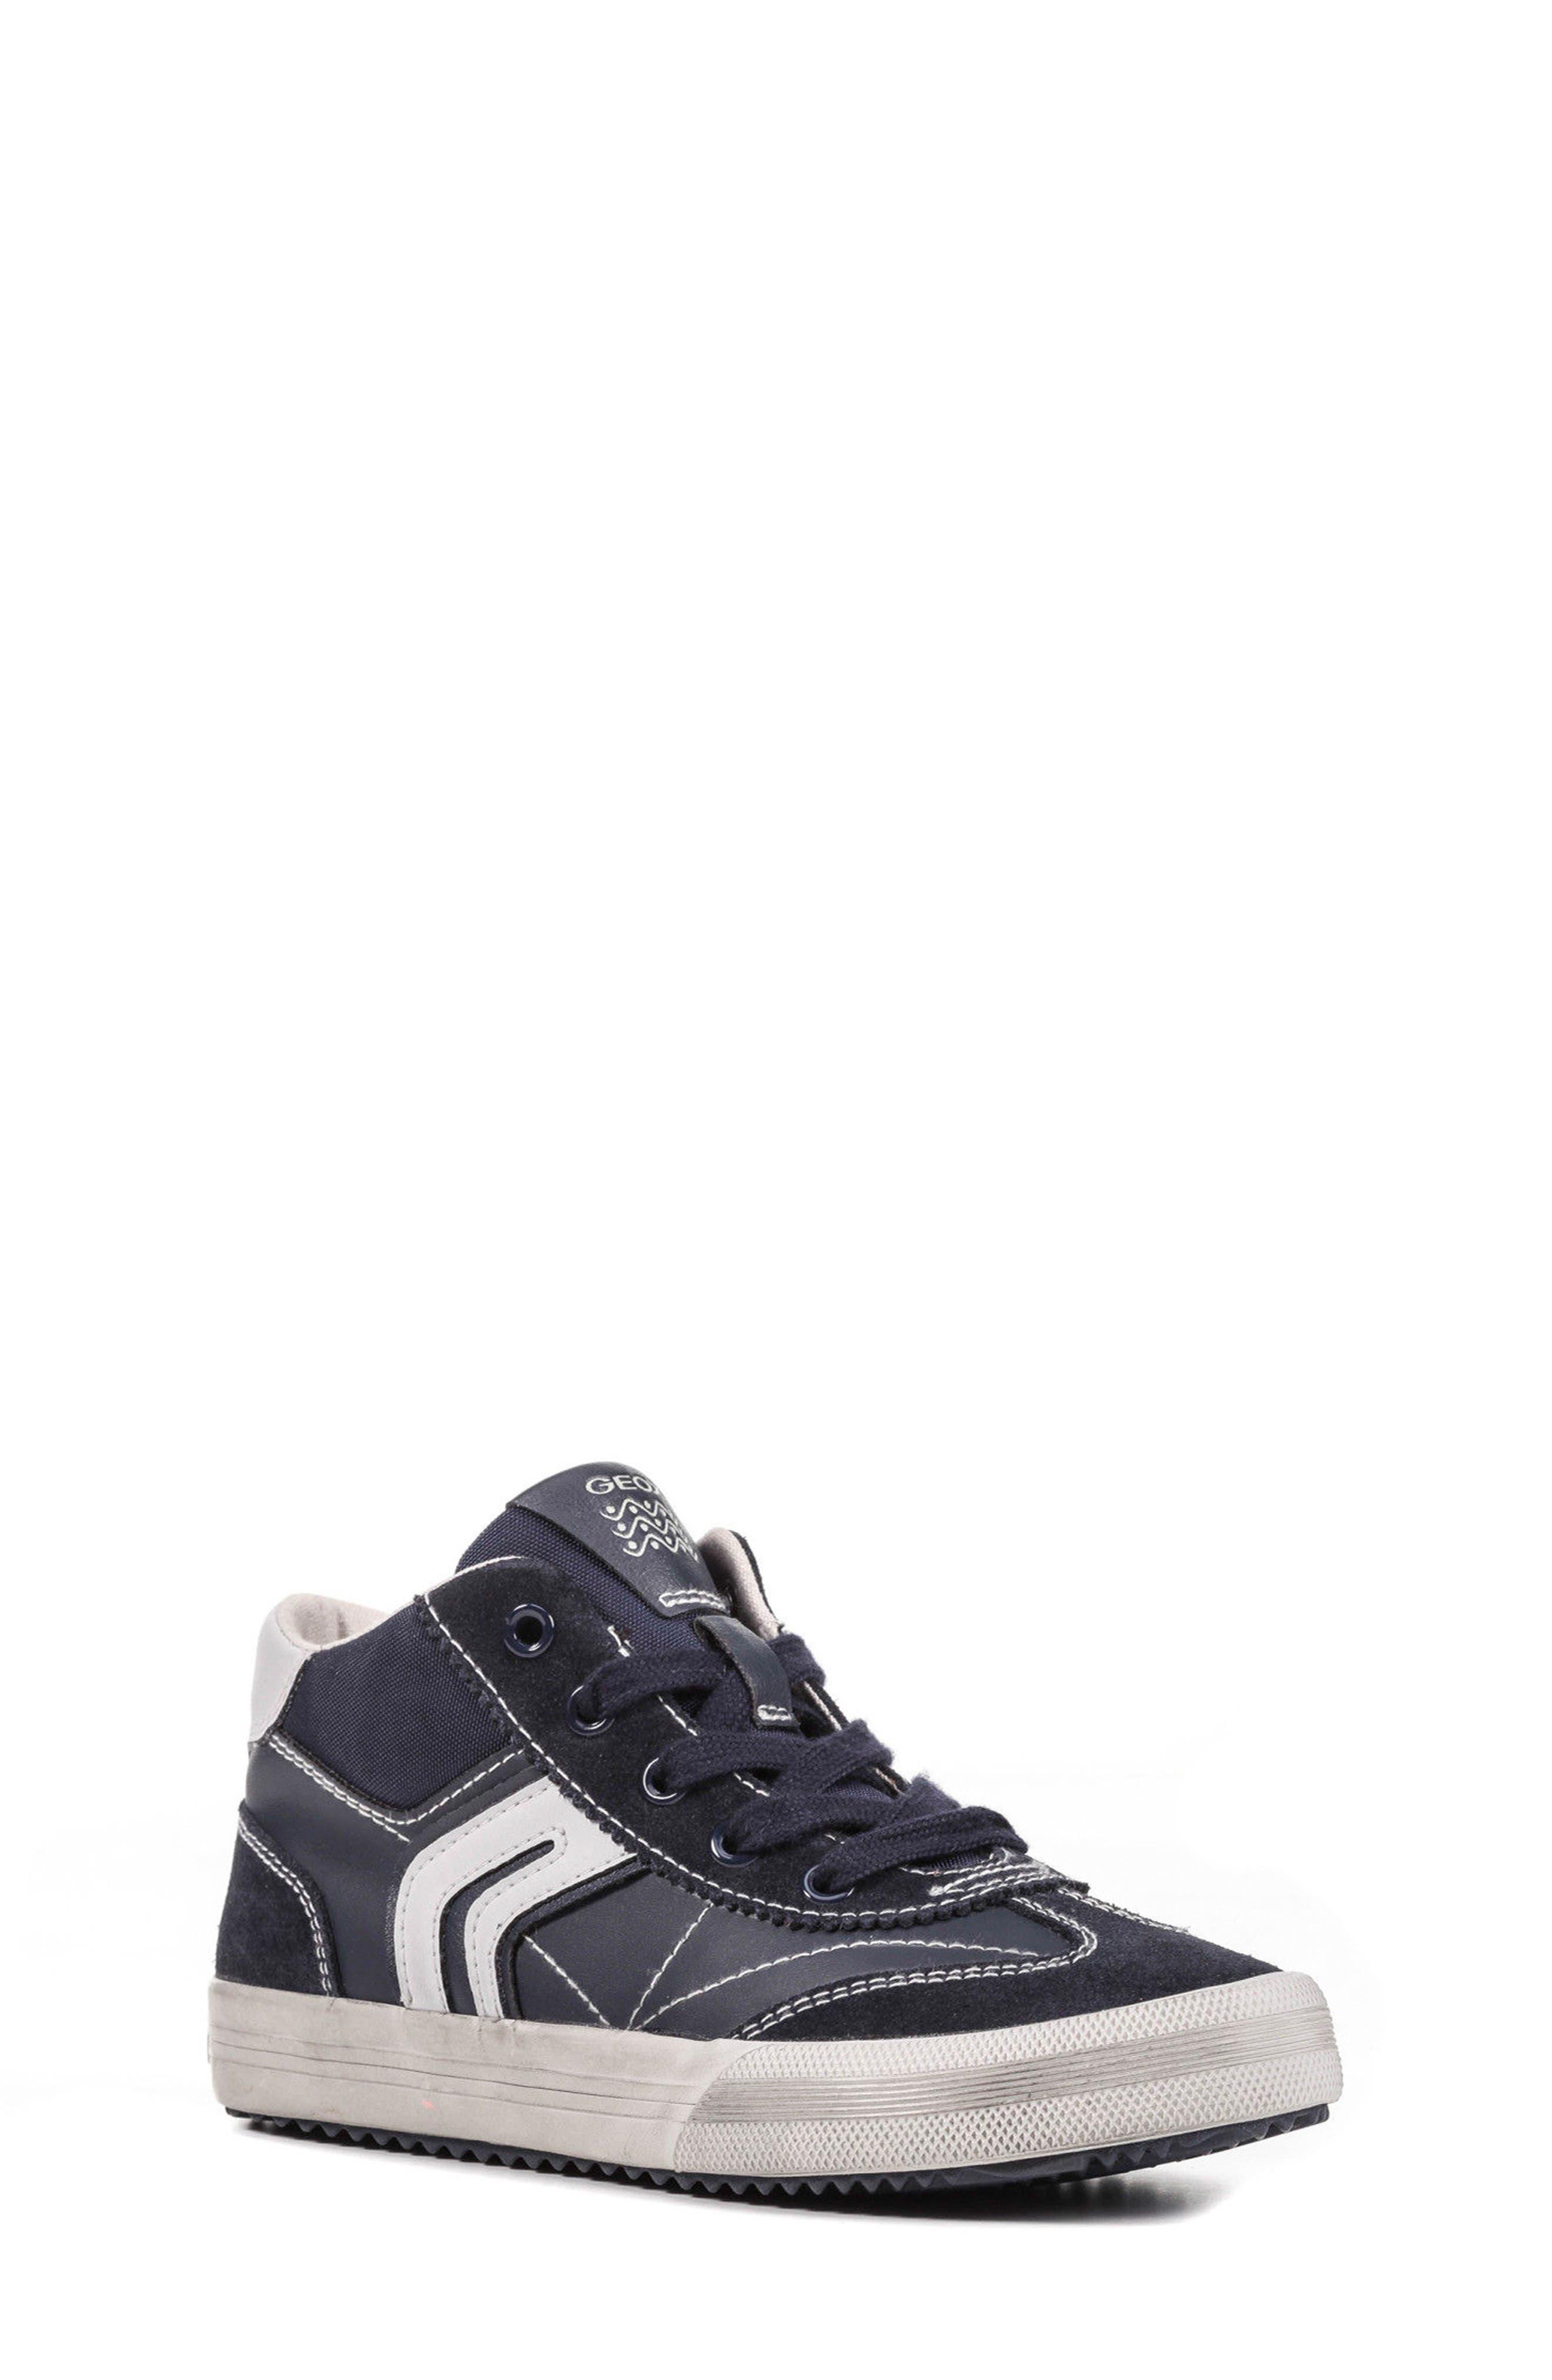 Geox Alonisso Mid Top Sneaker (Toddler, Little Kid & Big Kid)